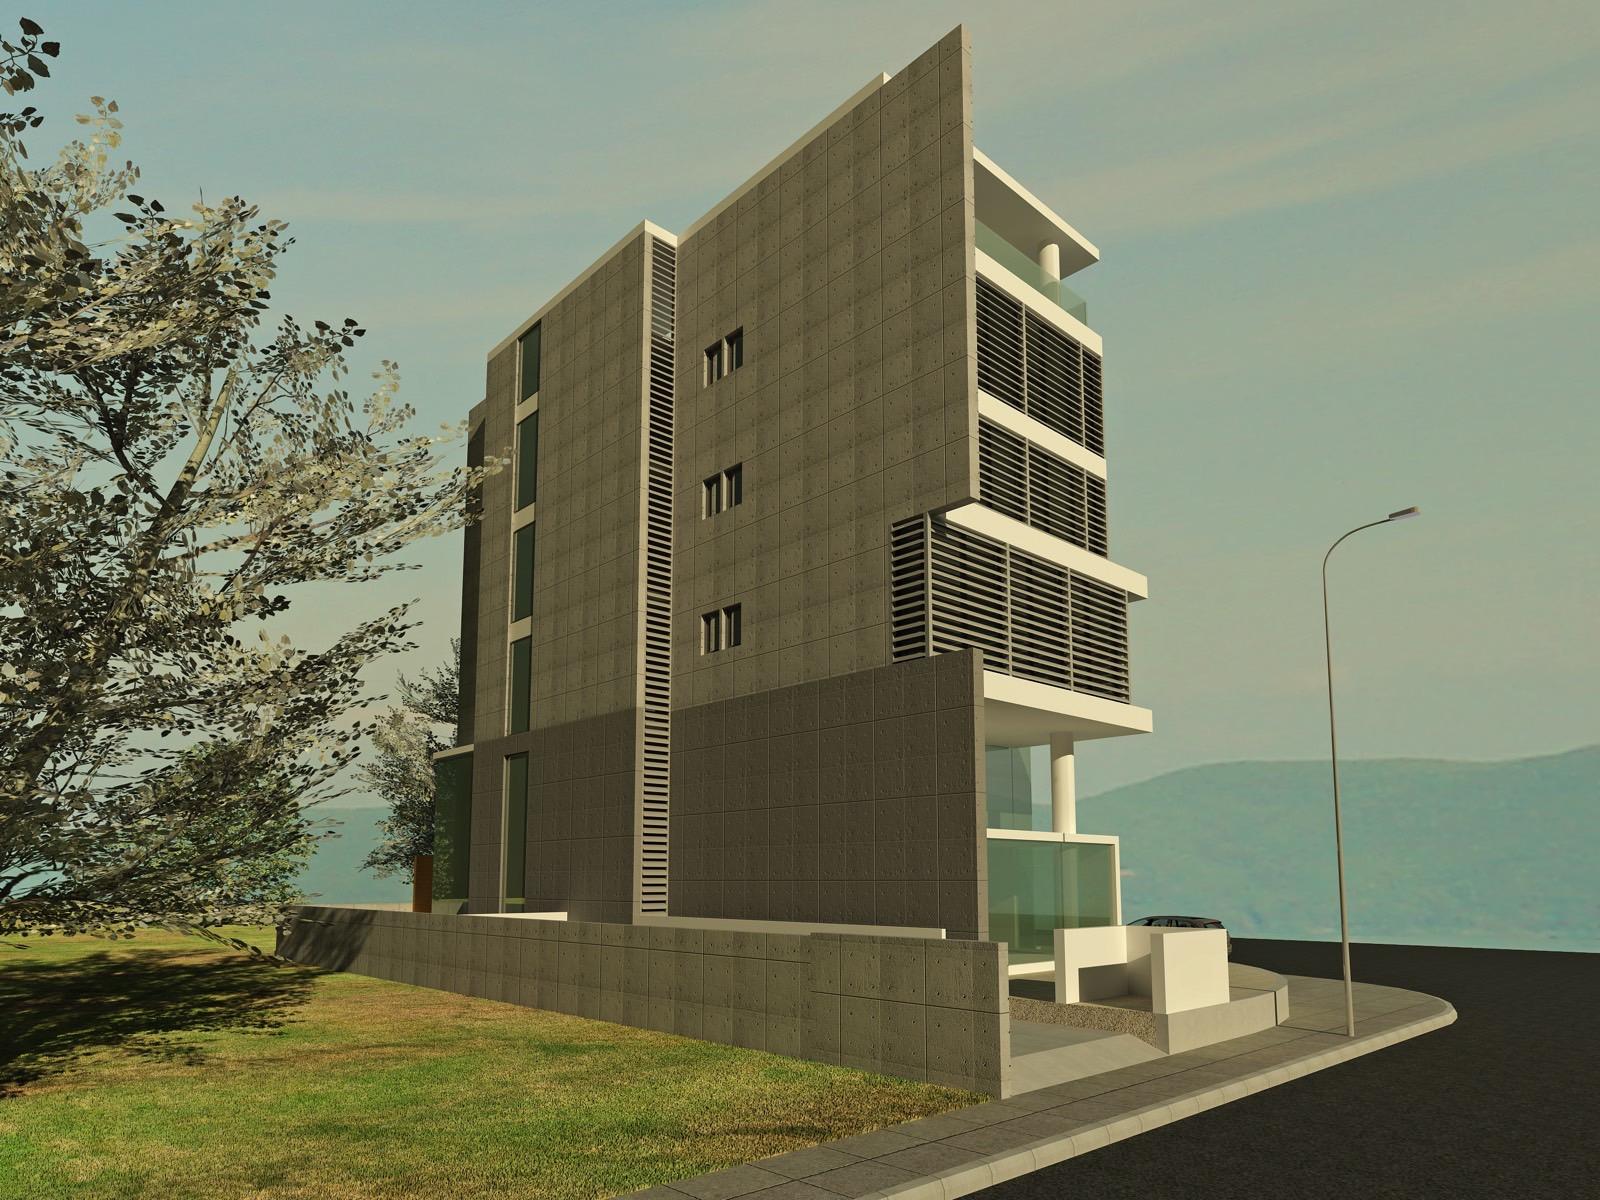 office building cam 4.jpg